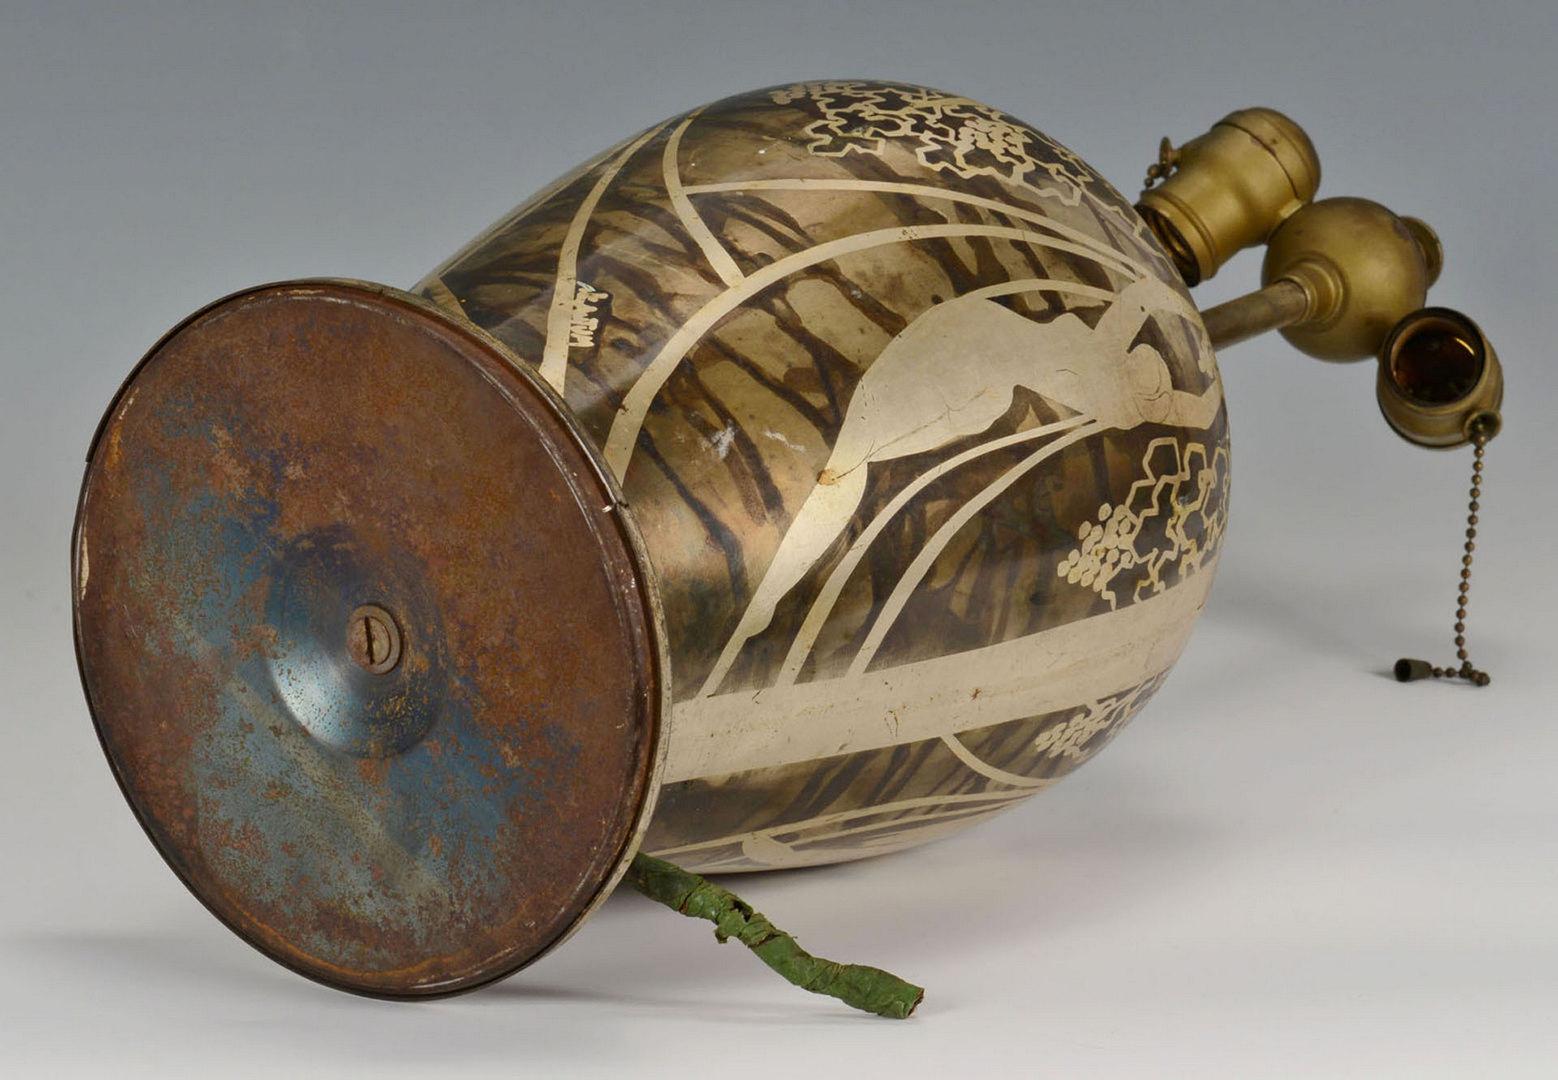 Lot 379: Art Deco Period Mica Lamp